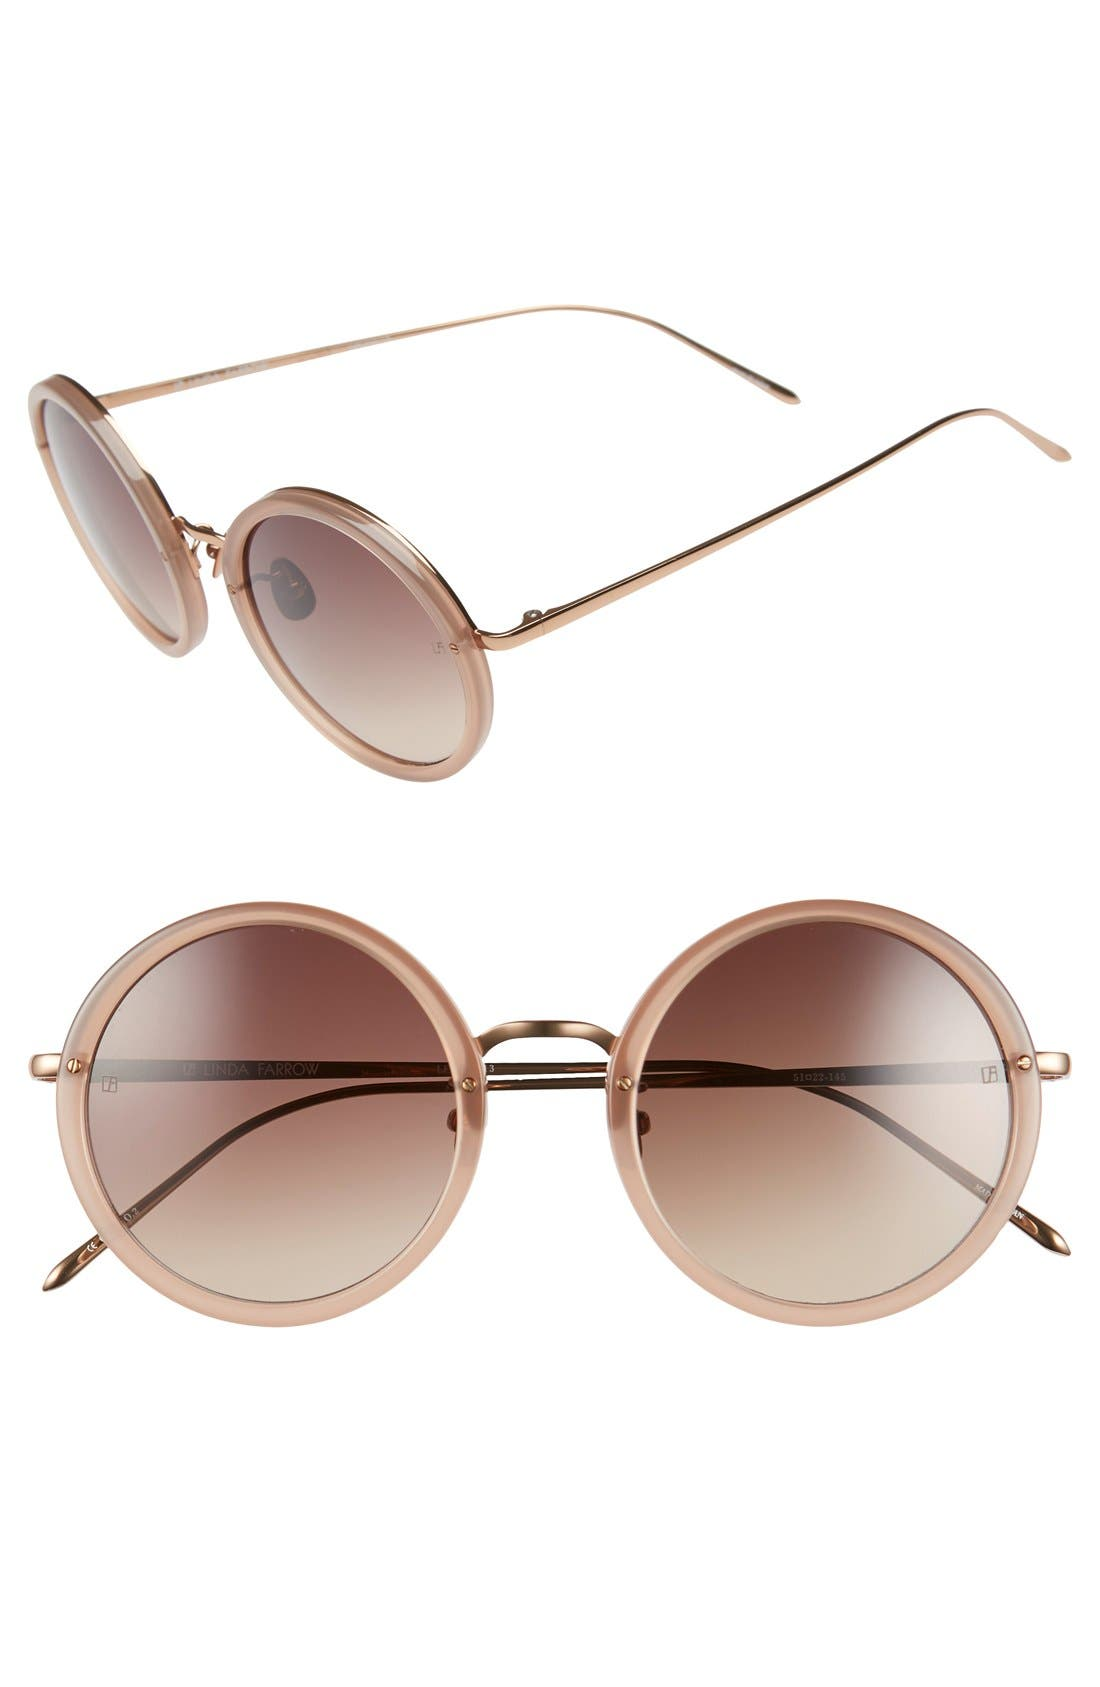 51mm Round 18 Karat Rose Gold Sunglasses,                             Main thumbnail 2, color,